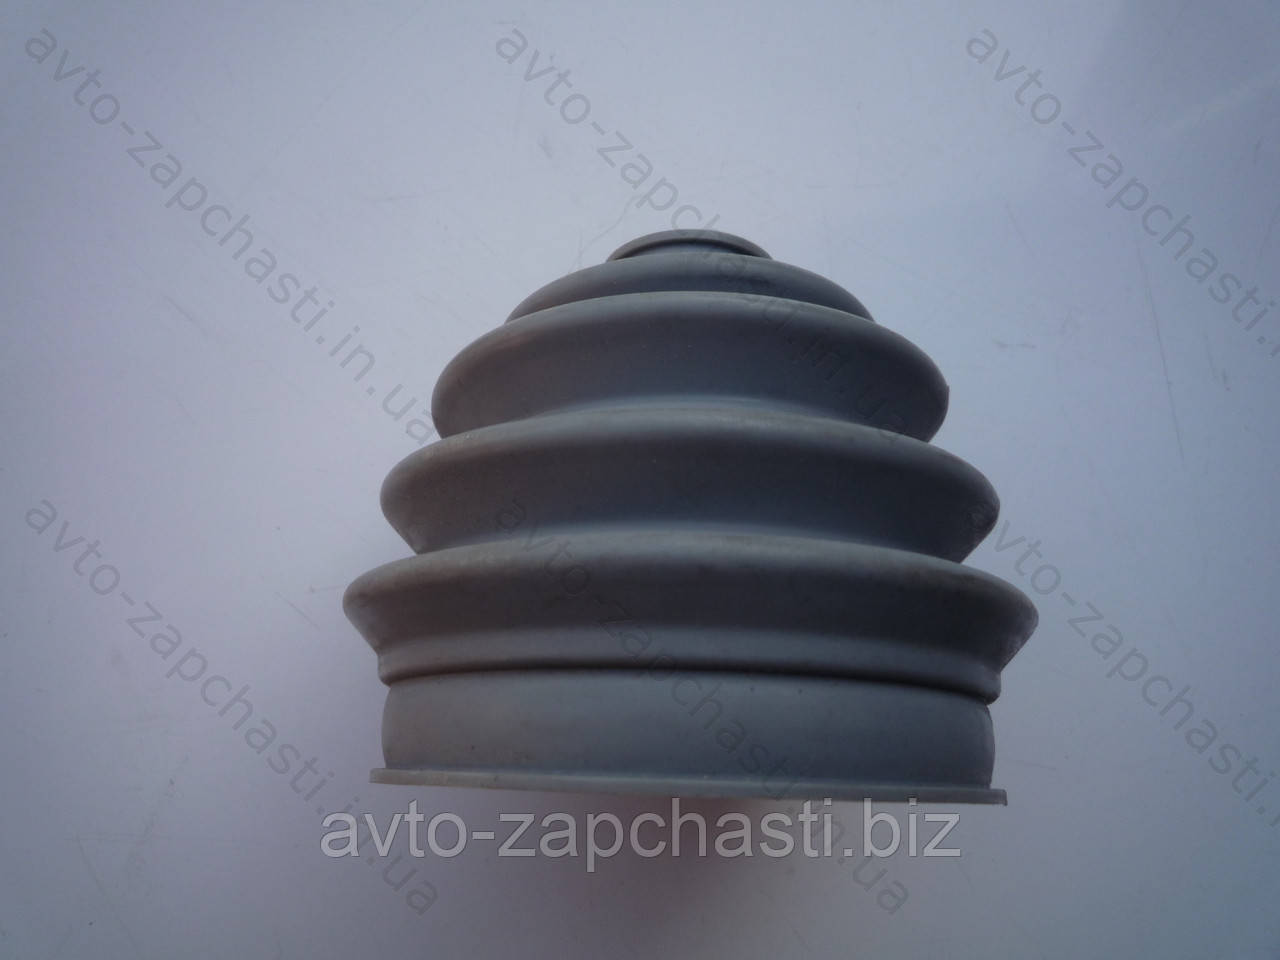 Пыльник шруса ВАЗ 2110 наружный (пр-во АвтоВАЗ) (21100-2215030-04)